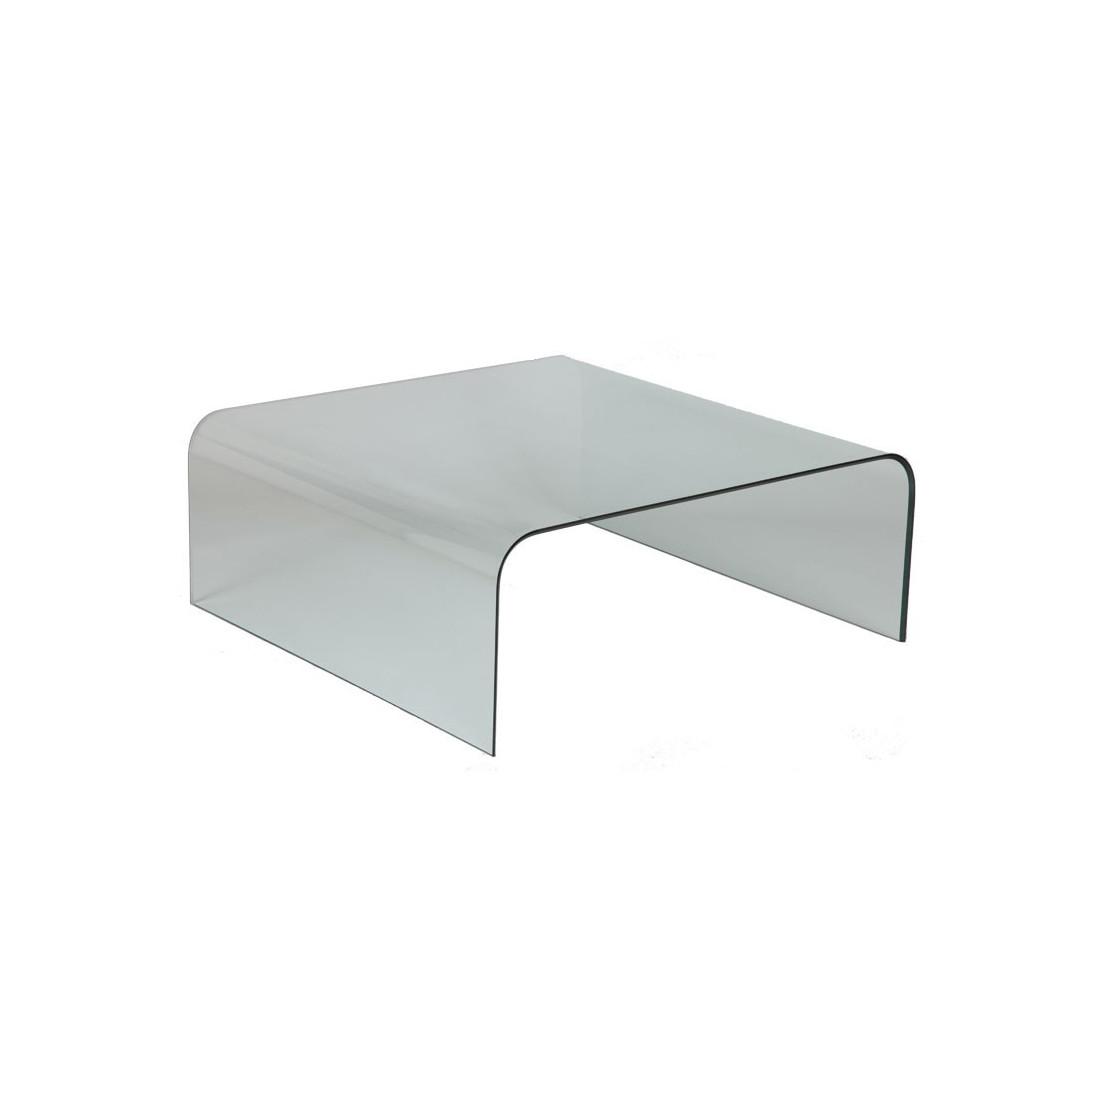 Table basse carr e en verre bright univers salon tousmesmeubles - Table basse verre carree ...